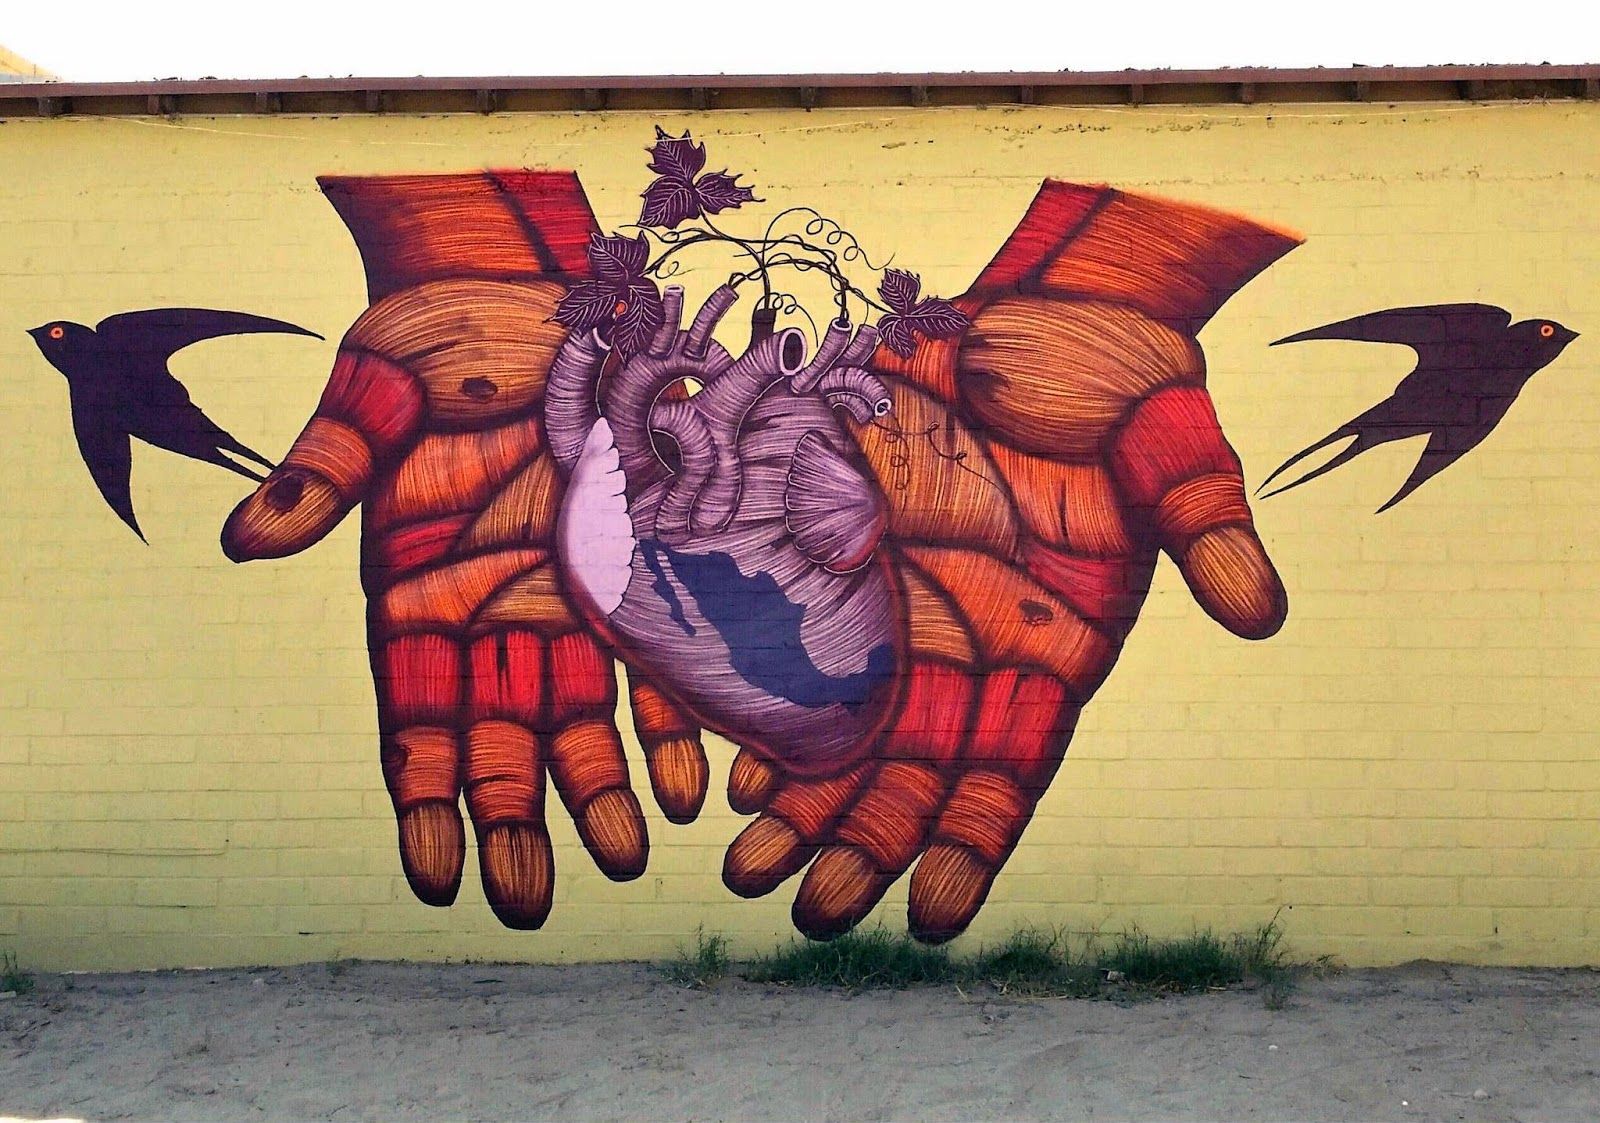 sego ovbal new mural coachella california streetartnews streetartnews. Black Bedroom Furniture Sets. Home Design Ideas